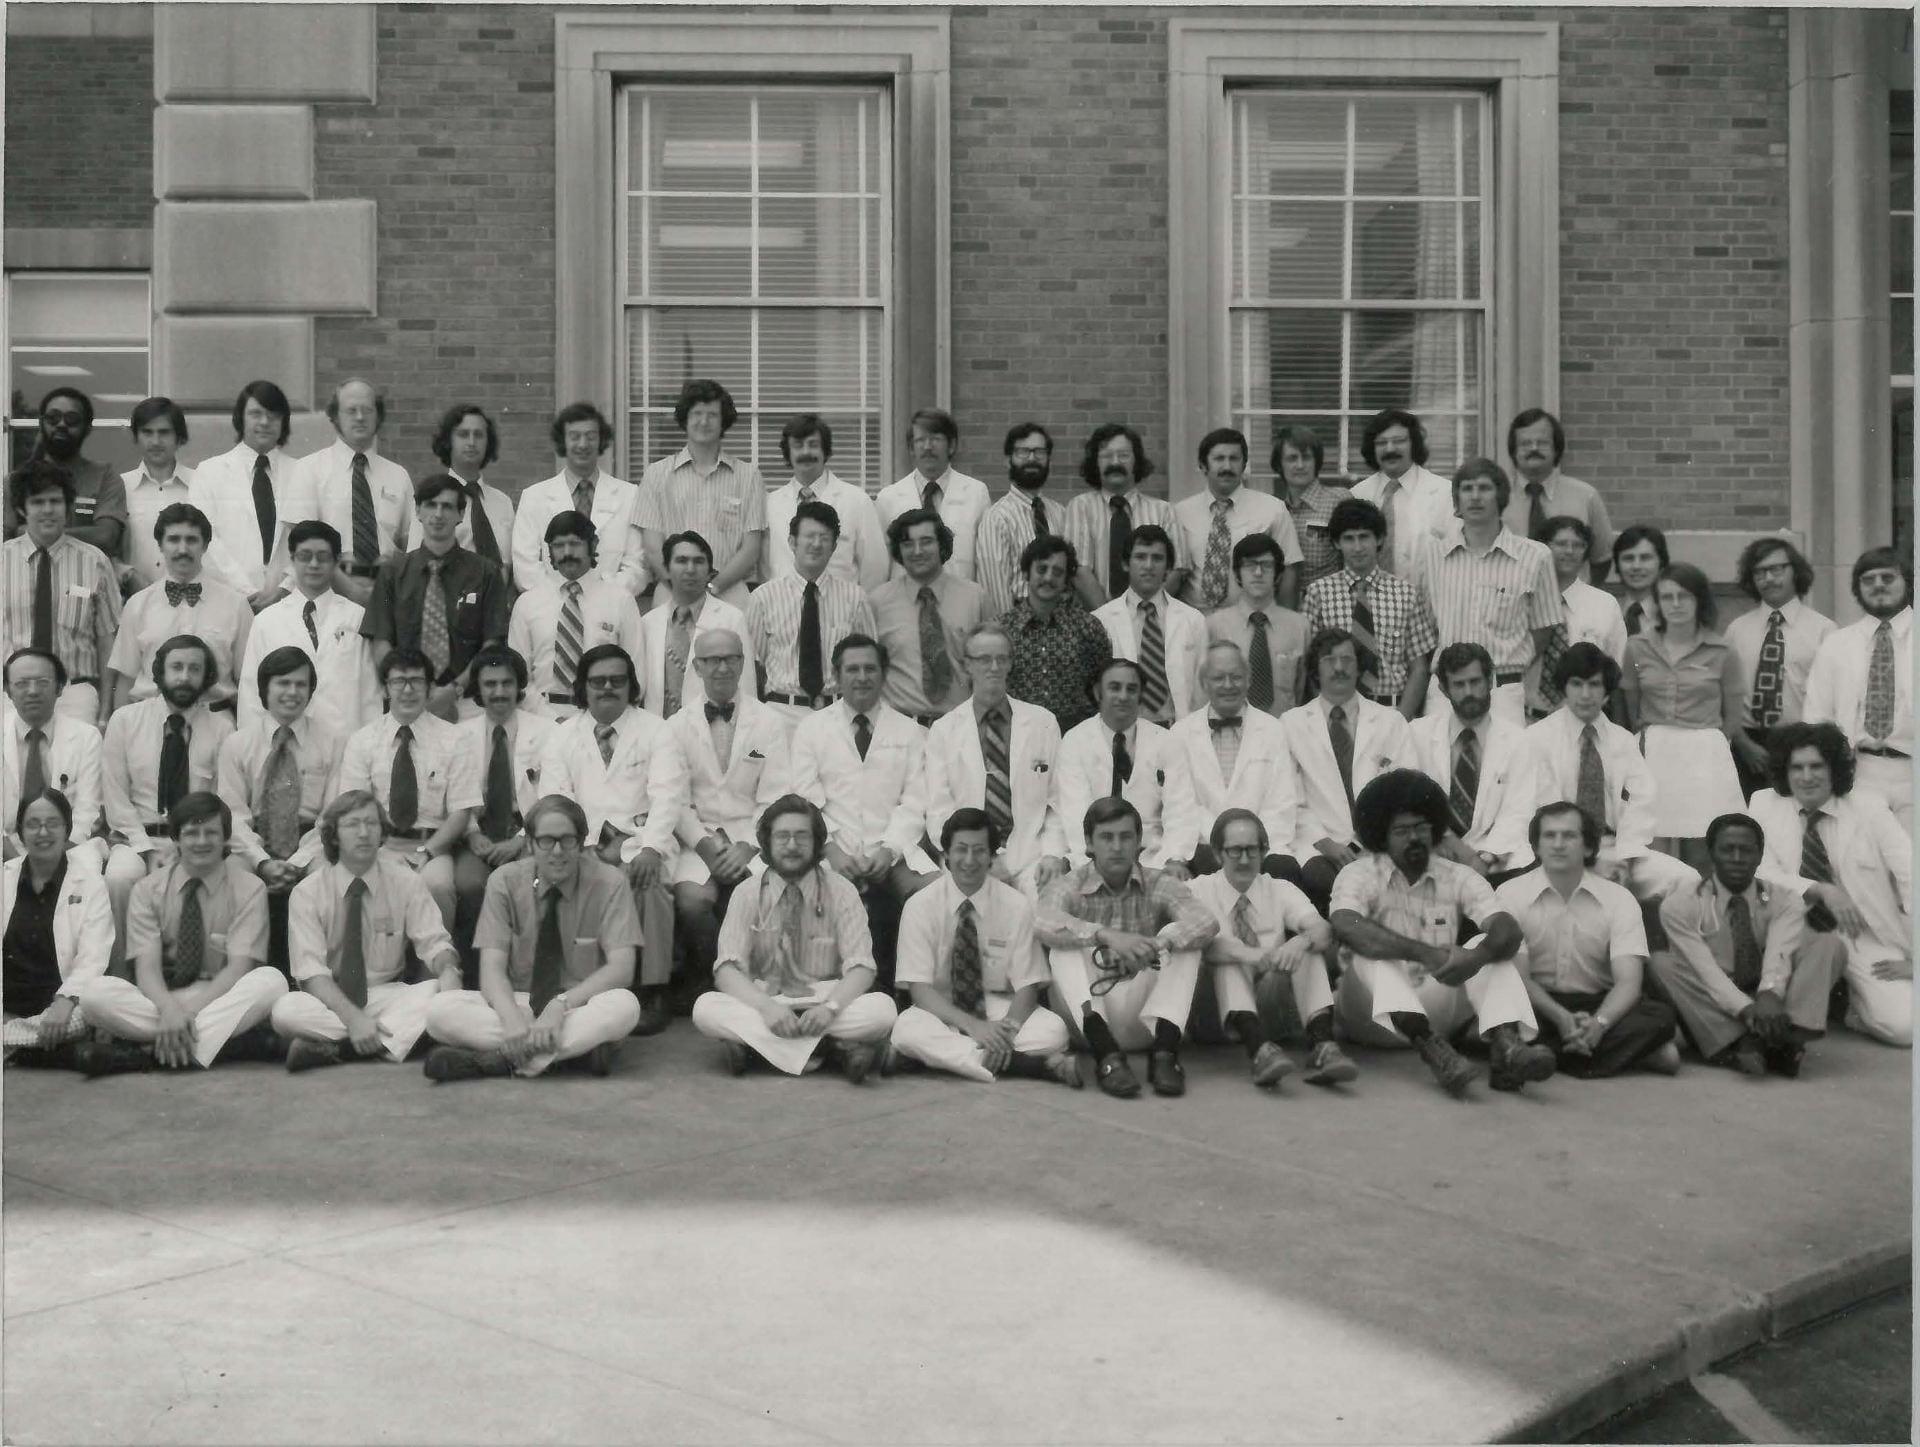 1974 Housestaff Photo